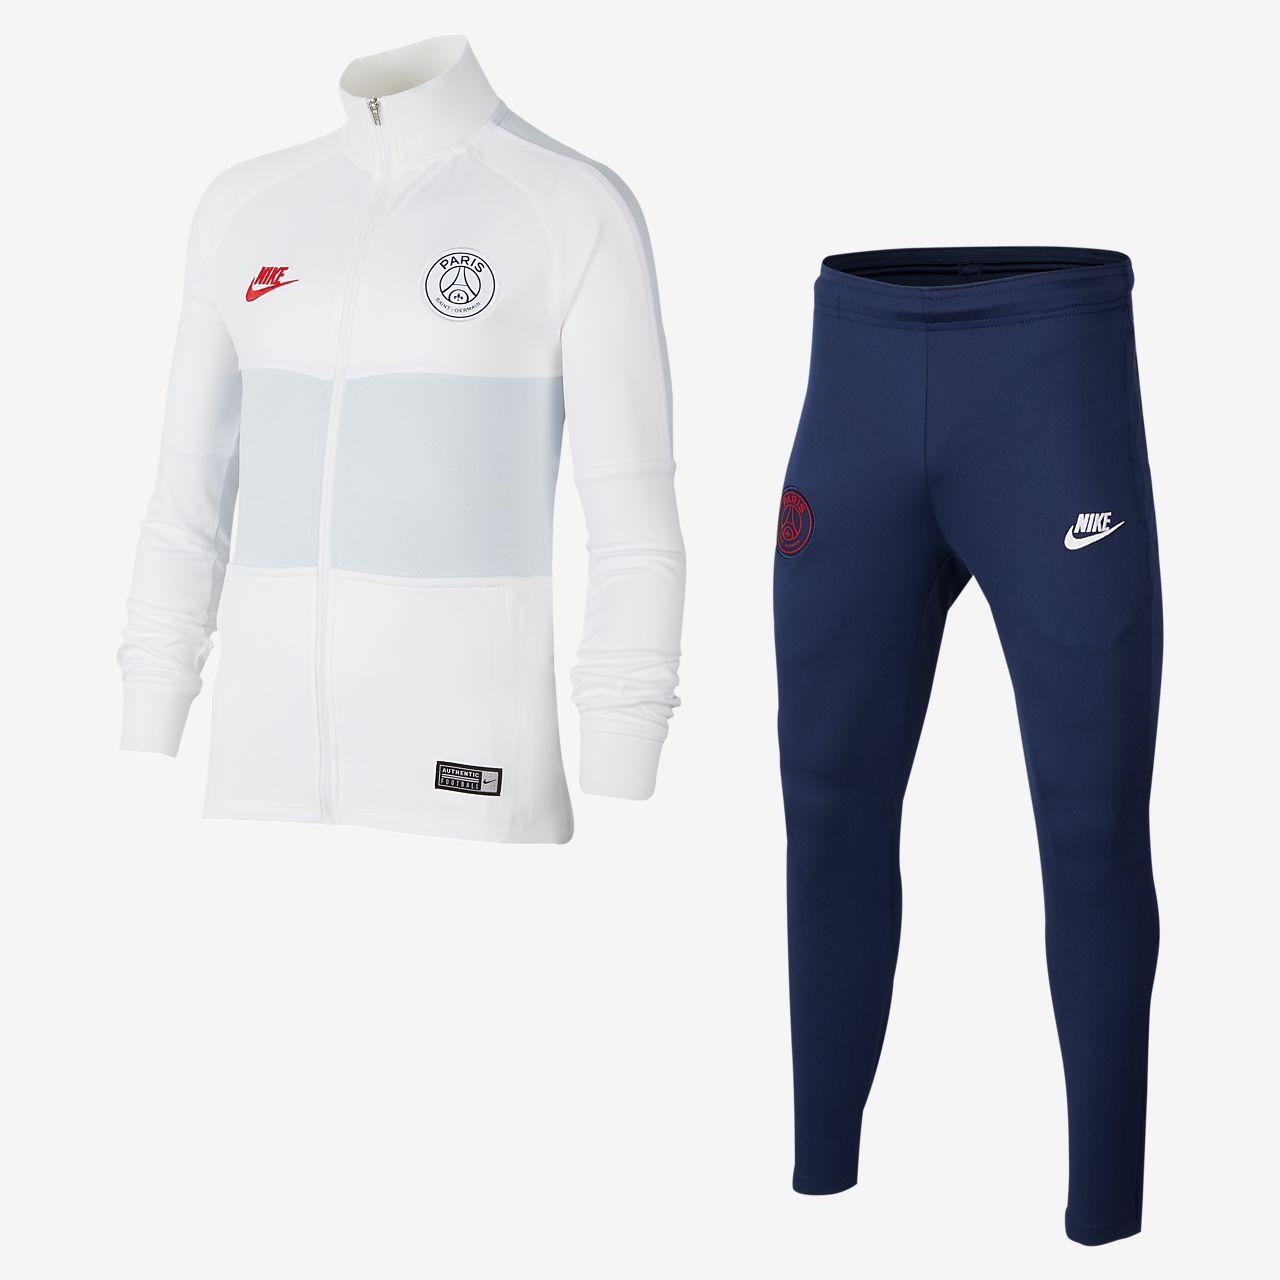 Nike Dri-FIT Paris Saint-Germain Strike Xandall de futbol - Home